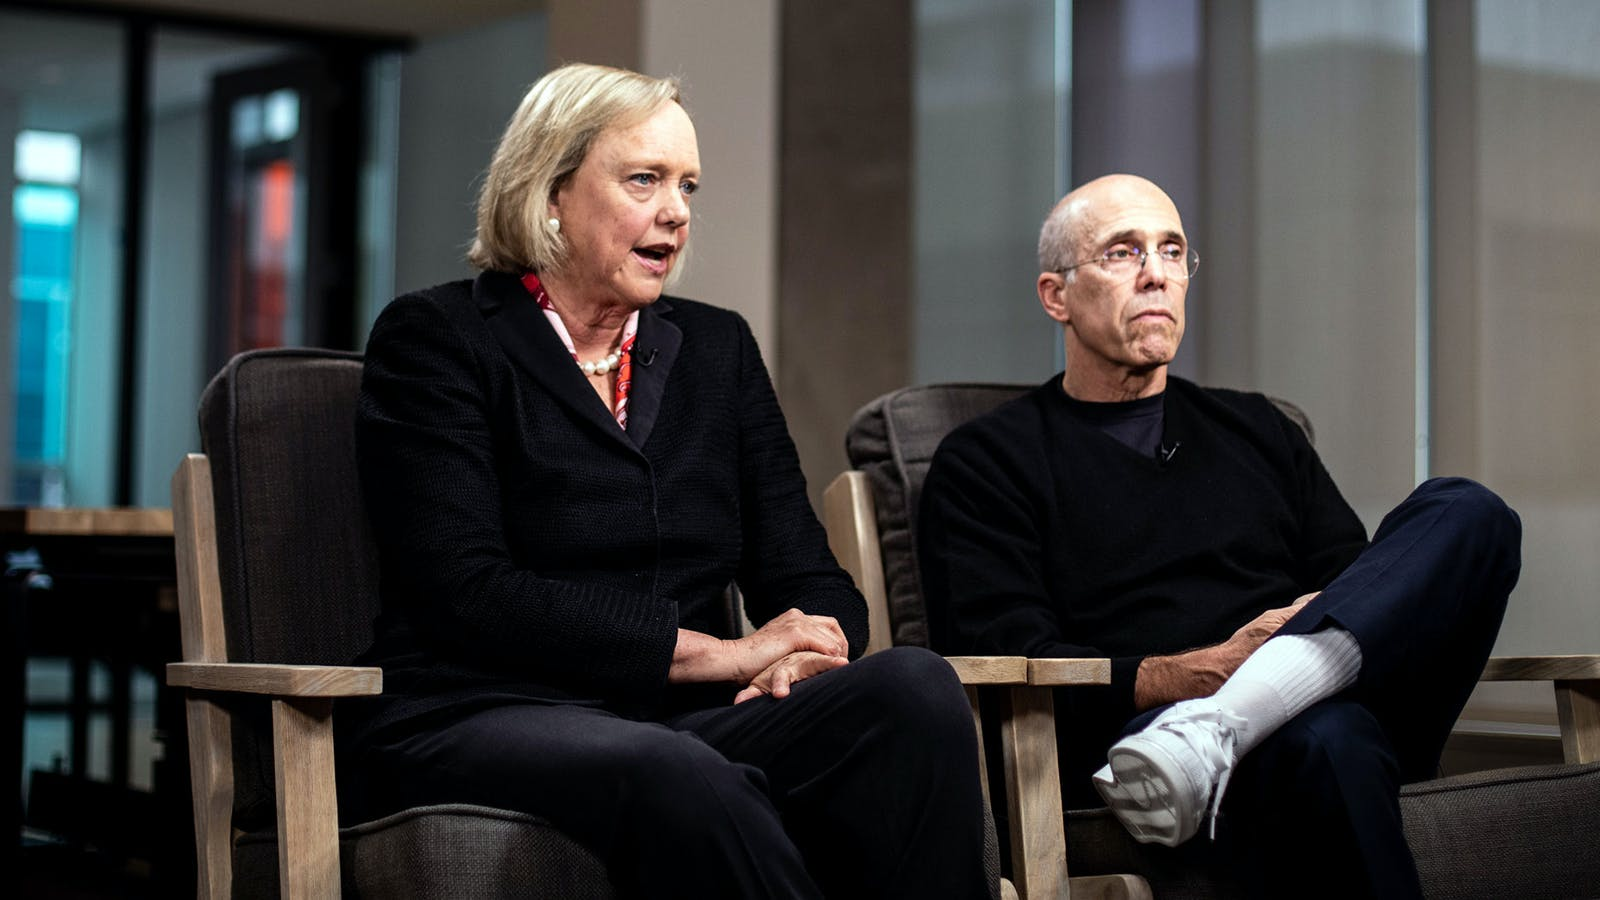 Meg Whitman and Jeffrey Katzenberg. Photo by Bloomberg.